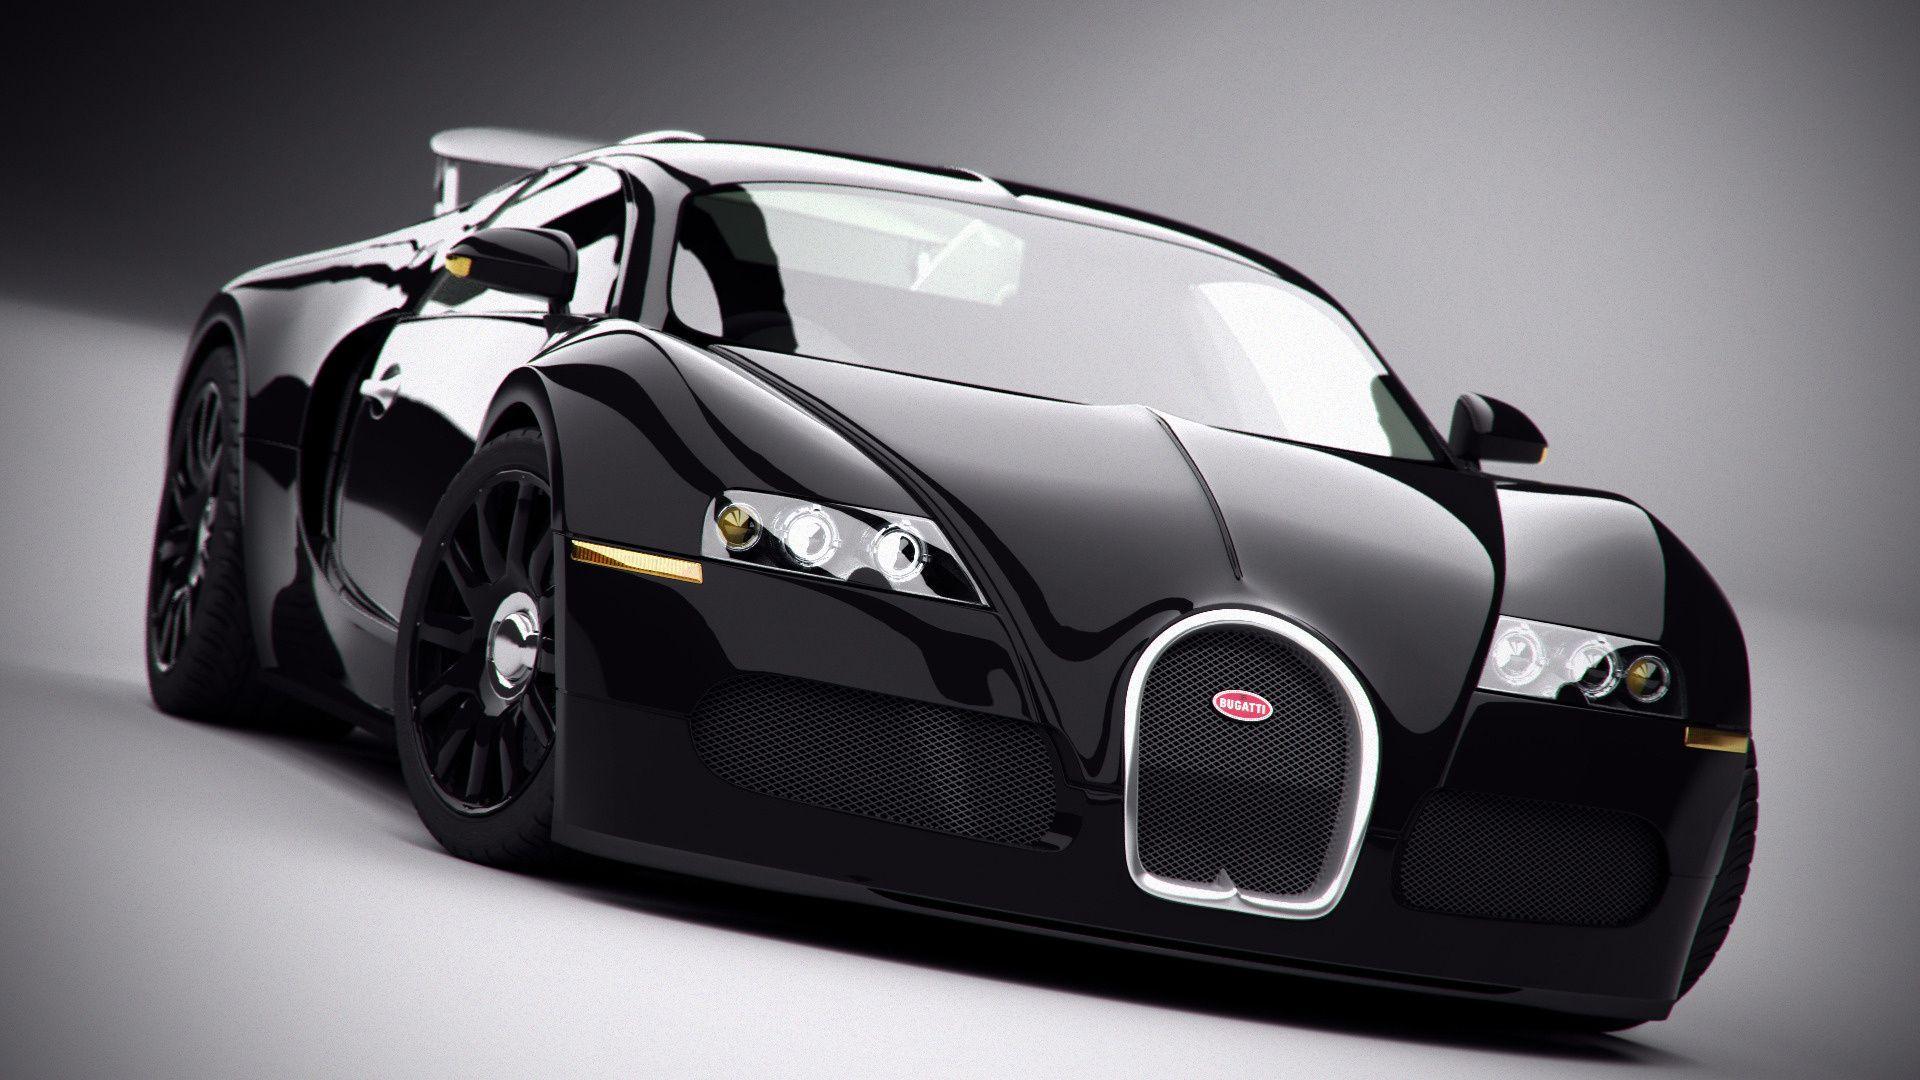 Bugatti Wallpaper 1920x1080 60492